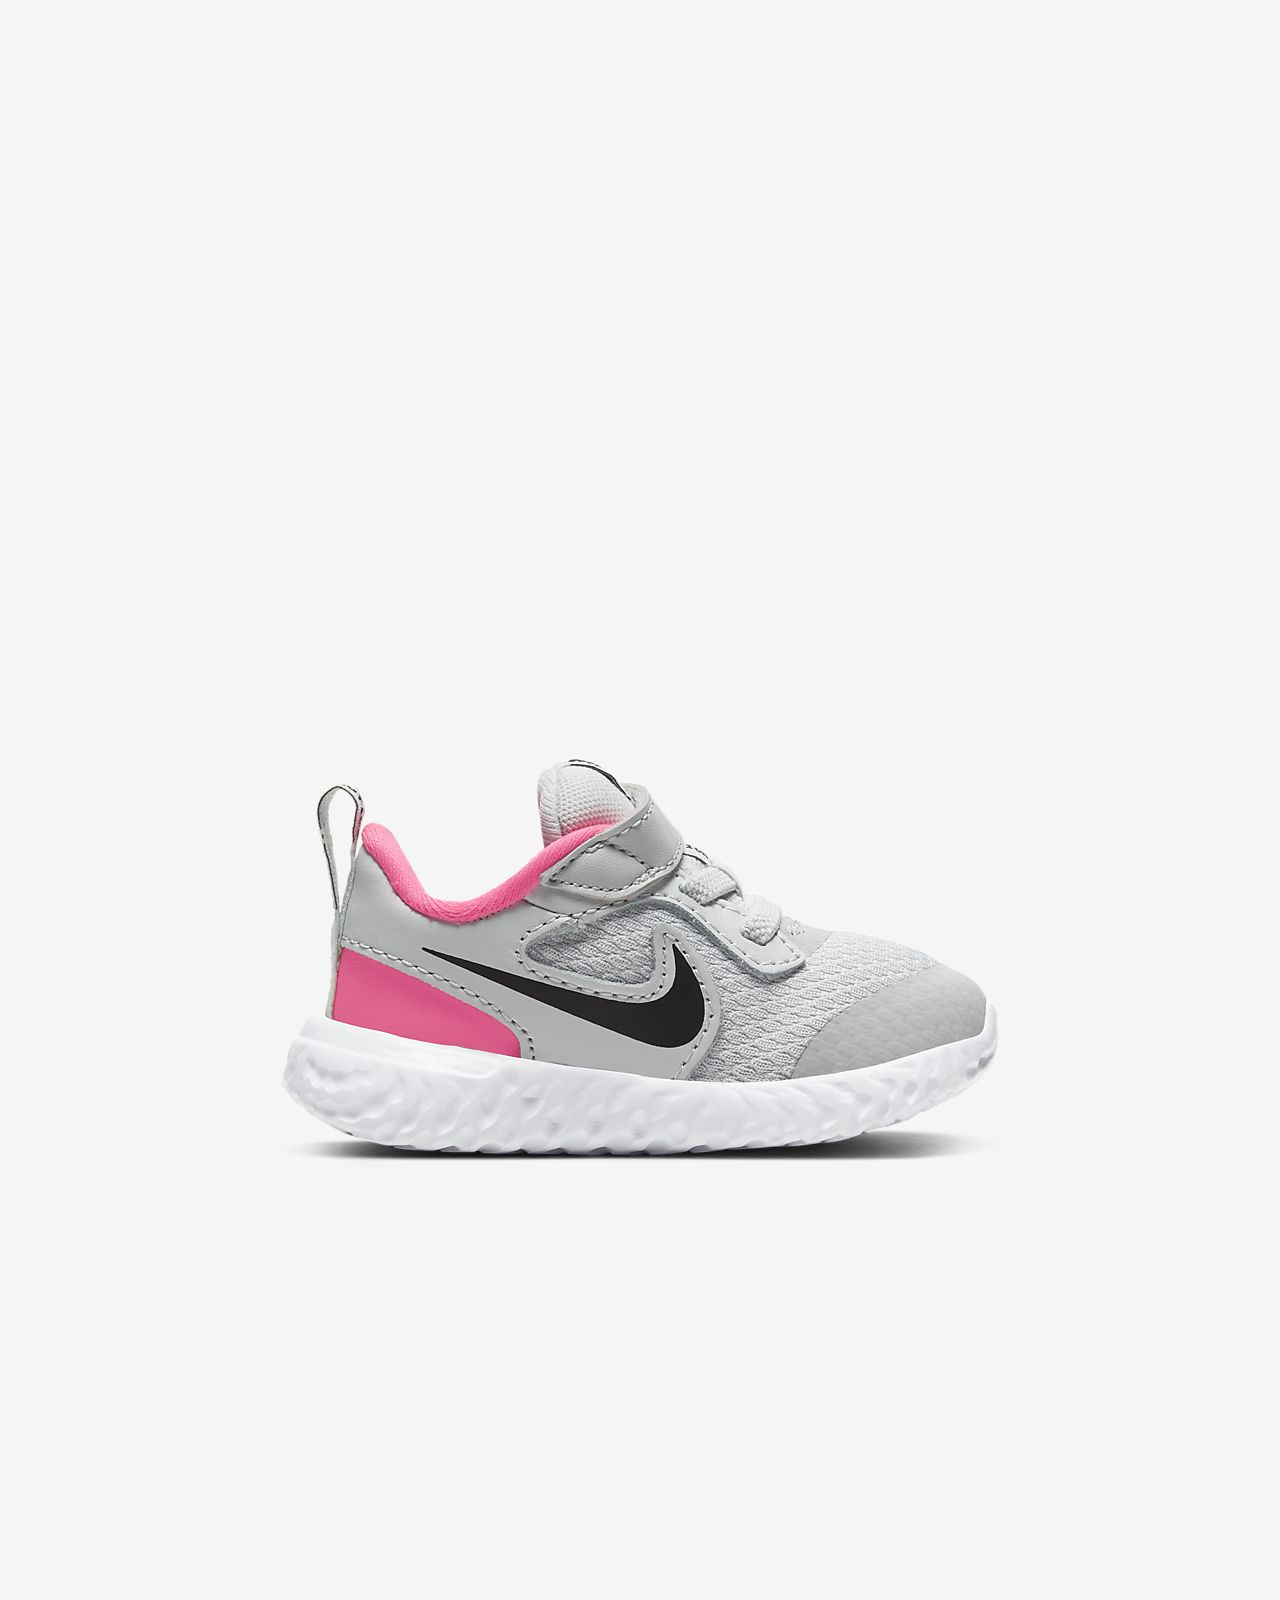 Nike Revolution 5 sko til babyersmåbørn